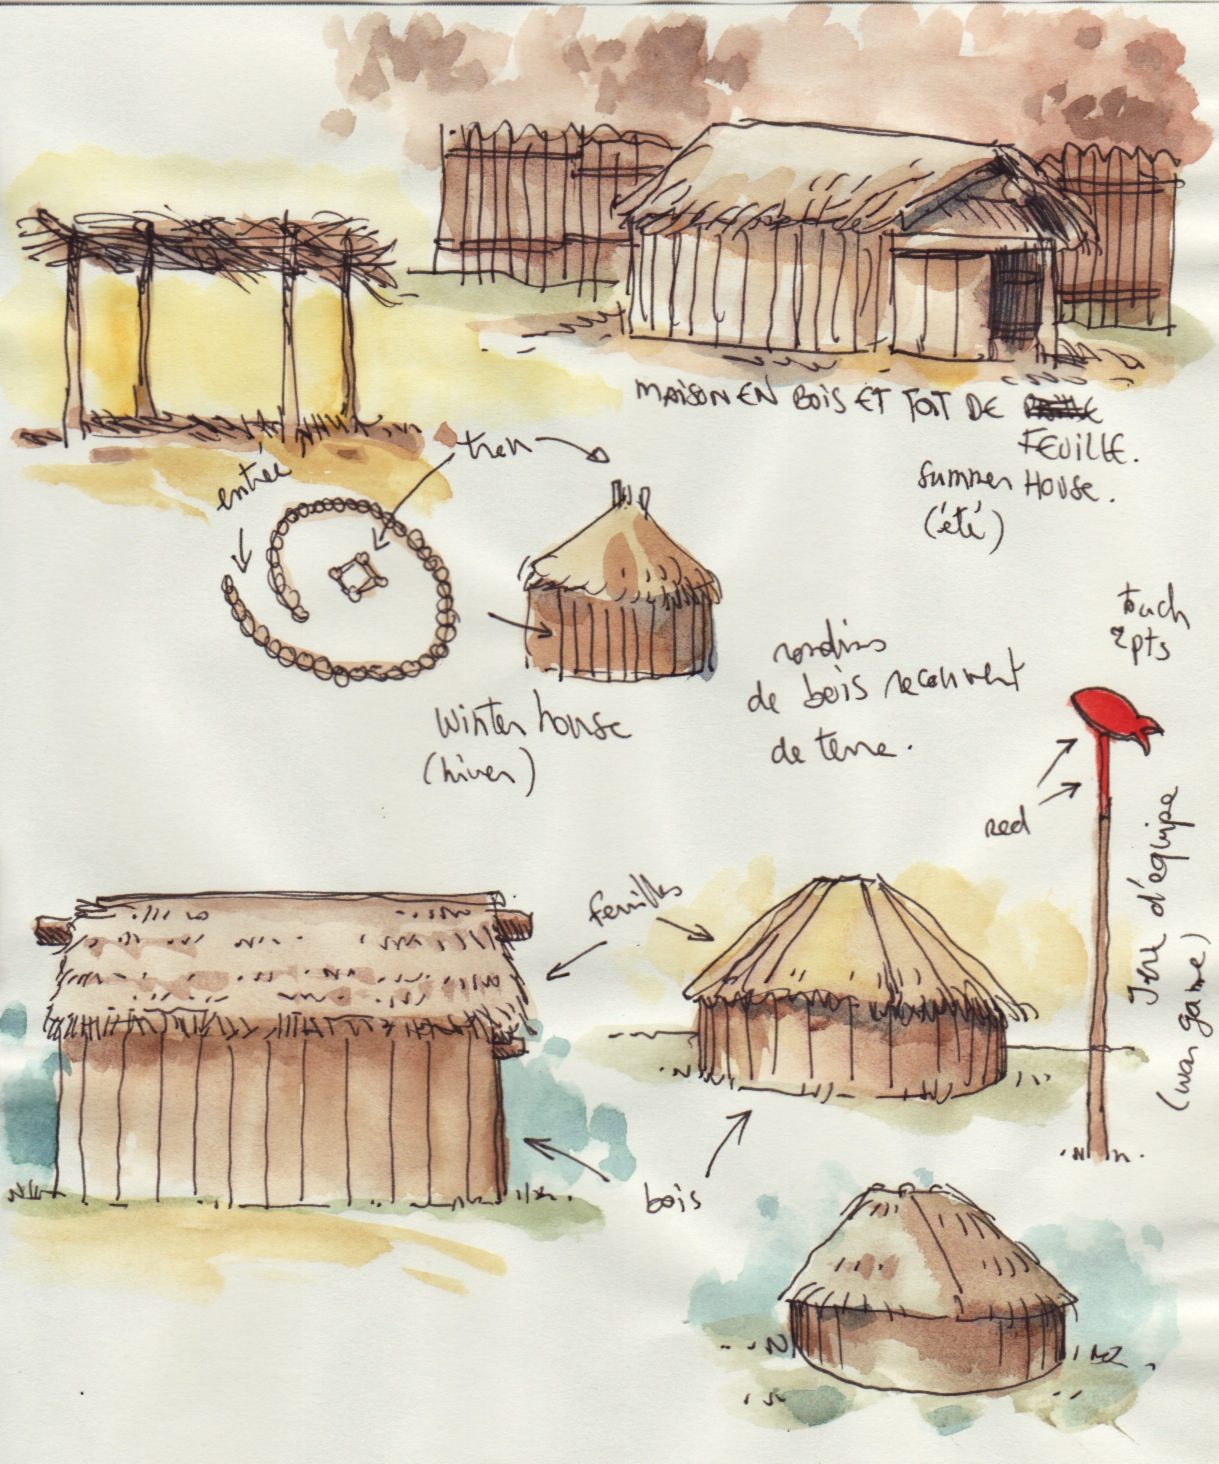 croquis de voyages trip sketches didier millotte le mus e de la tribu chickasaw oklahoma. Black Bedroom Furniture Sets. Home Design Ideas